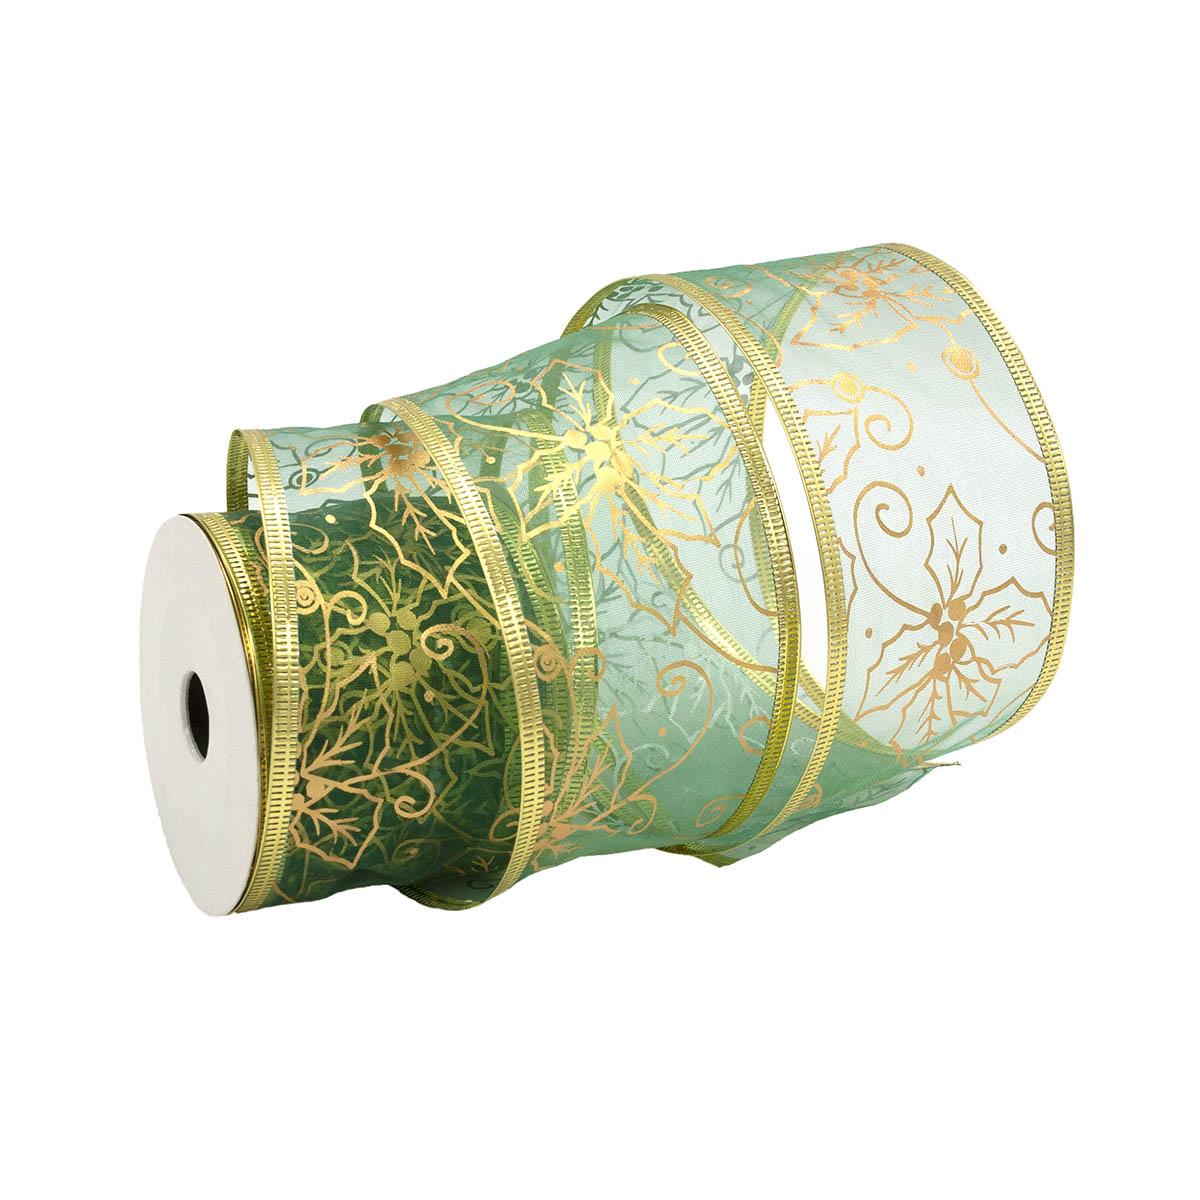 98-0078 Лента упаковочная (органза) 63 мм*10 м (зеленый) фото